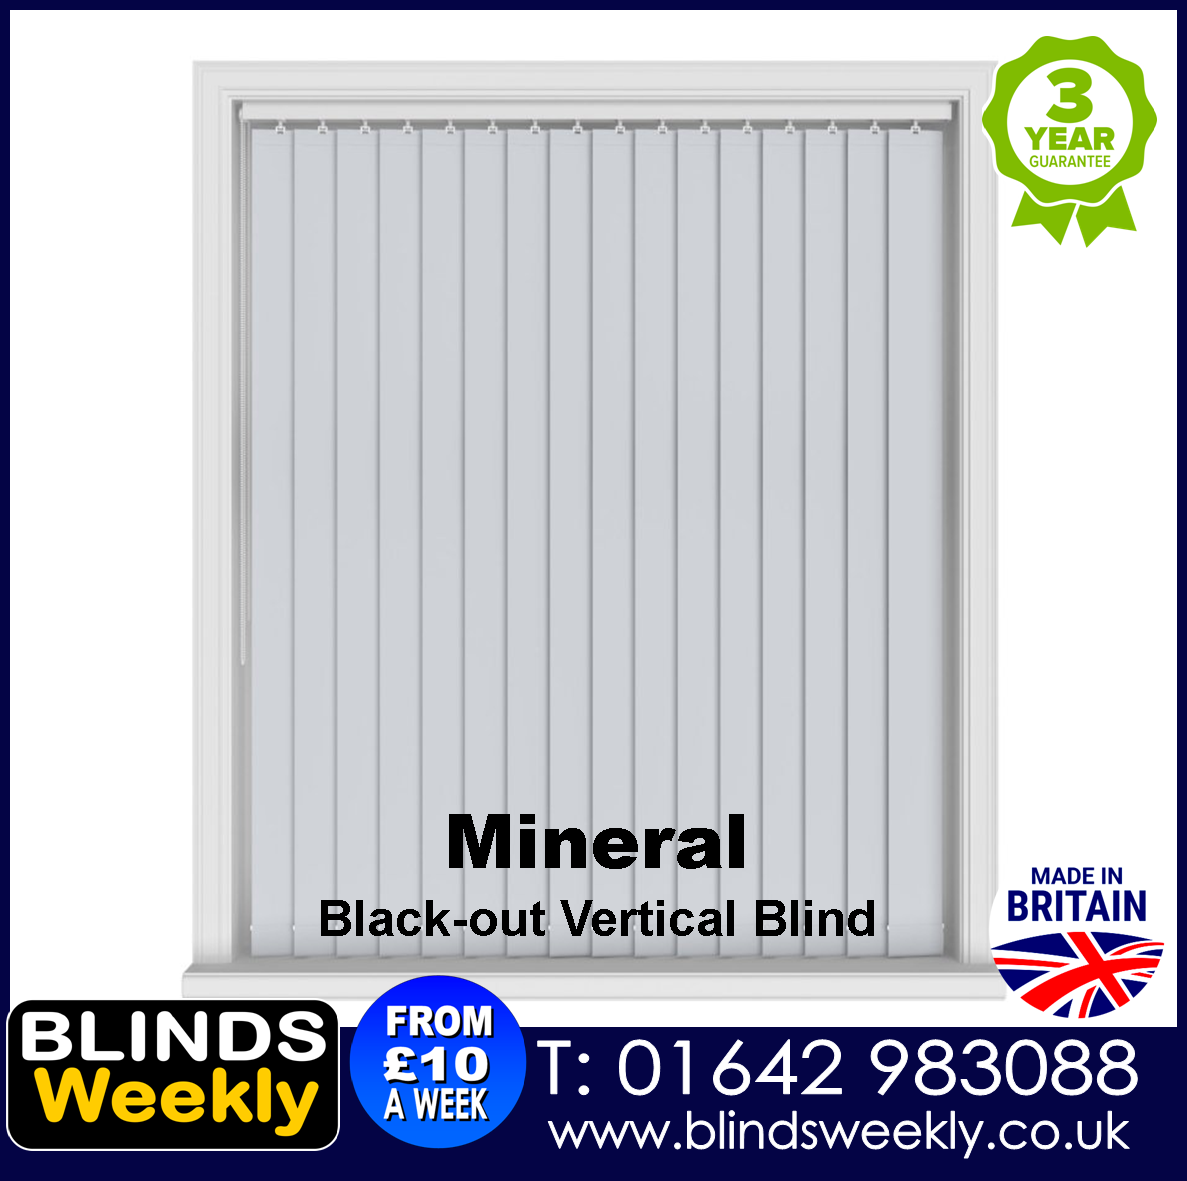 Blinds Weekly Blackout Vertical Blind - Mineral